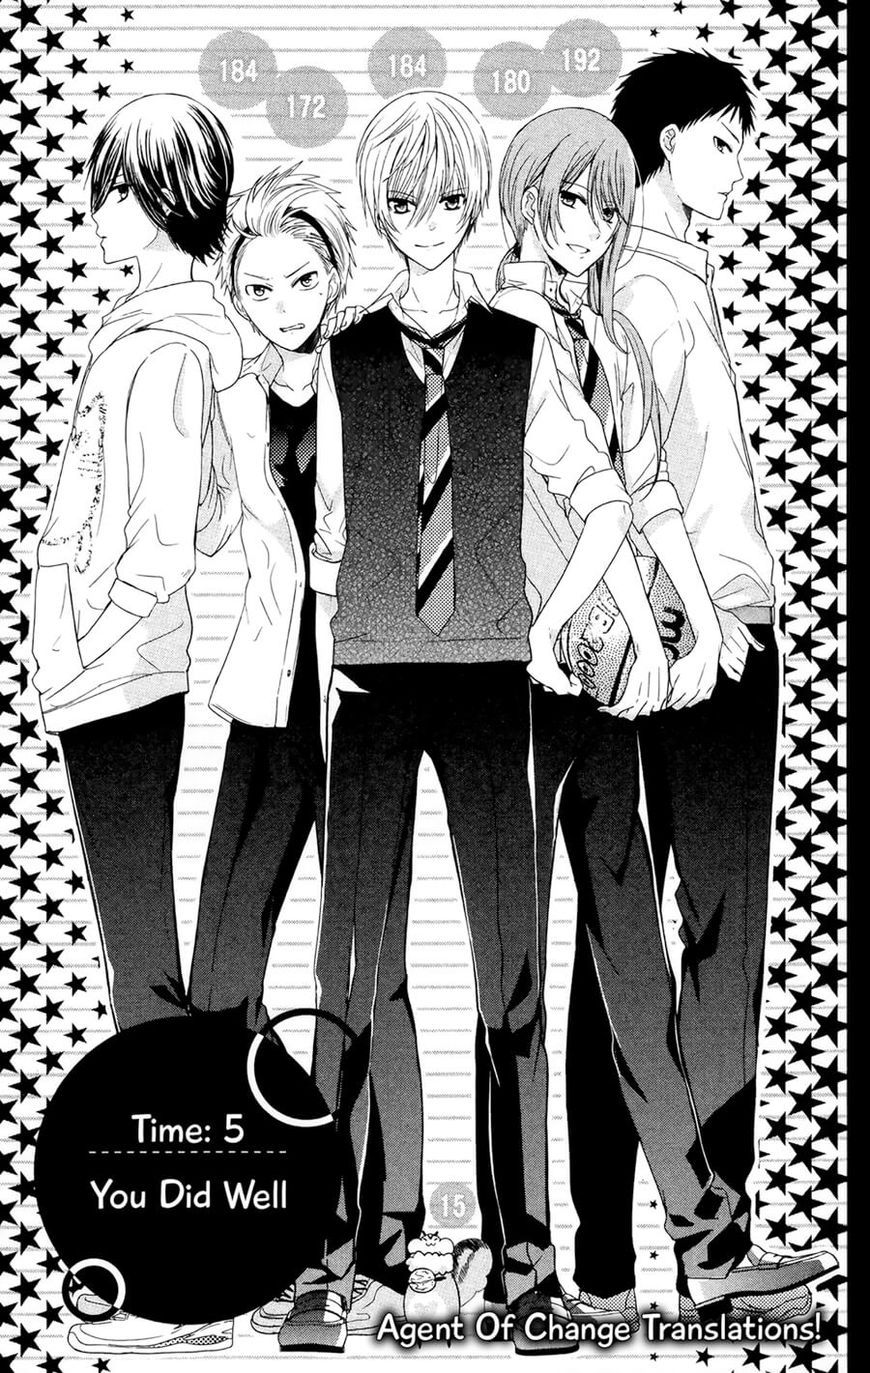 Aoba kun ni kikitai koto 5 page 3 manga boy manga anime anime